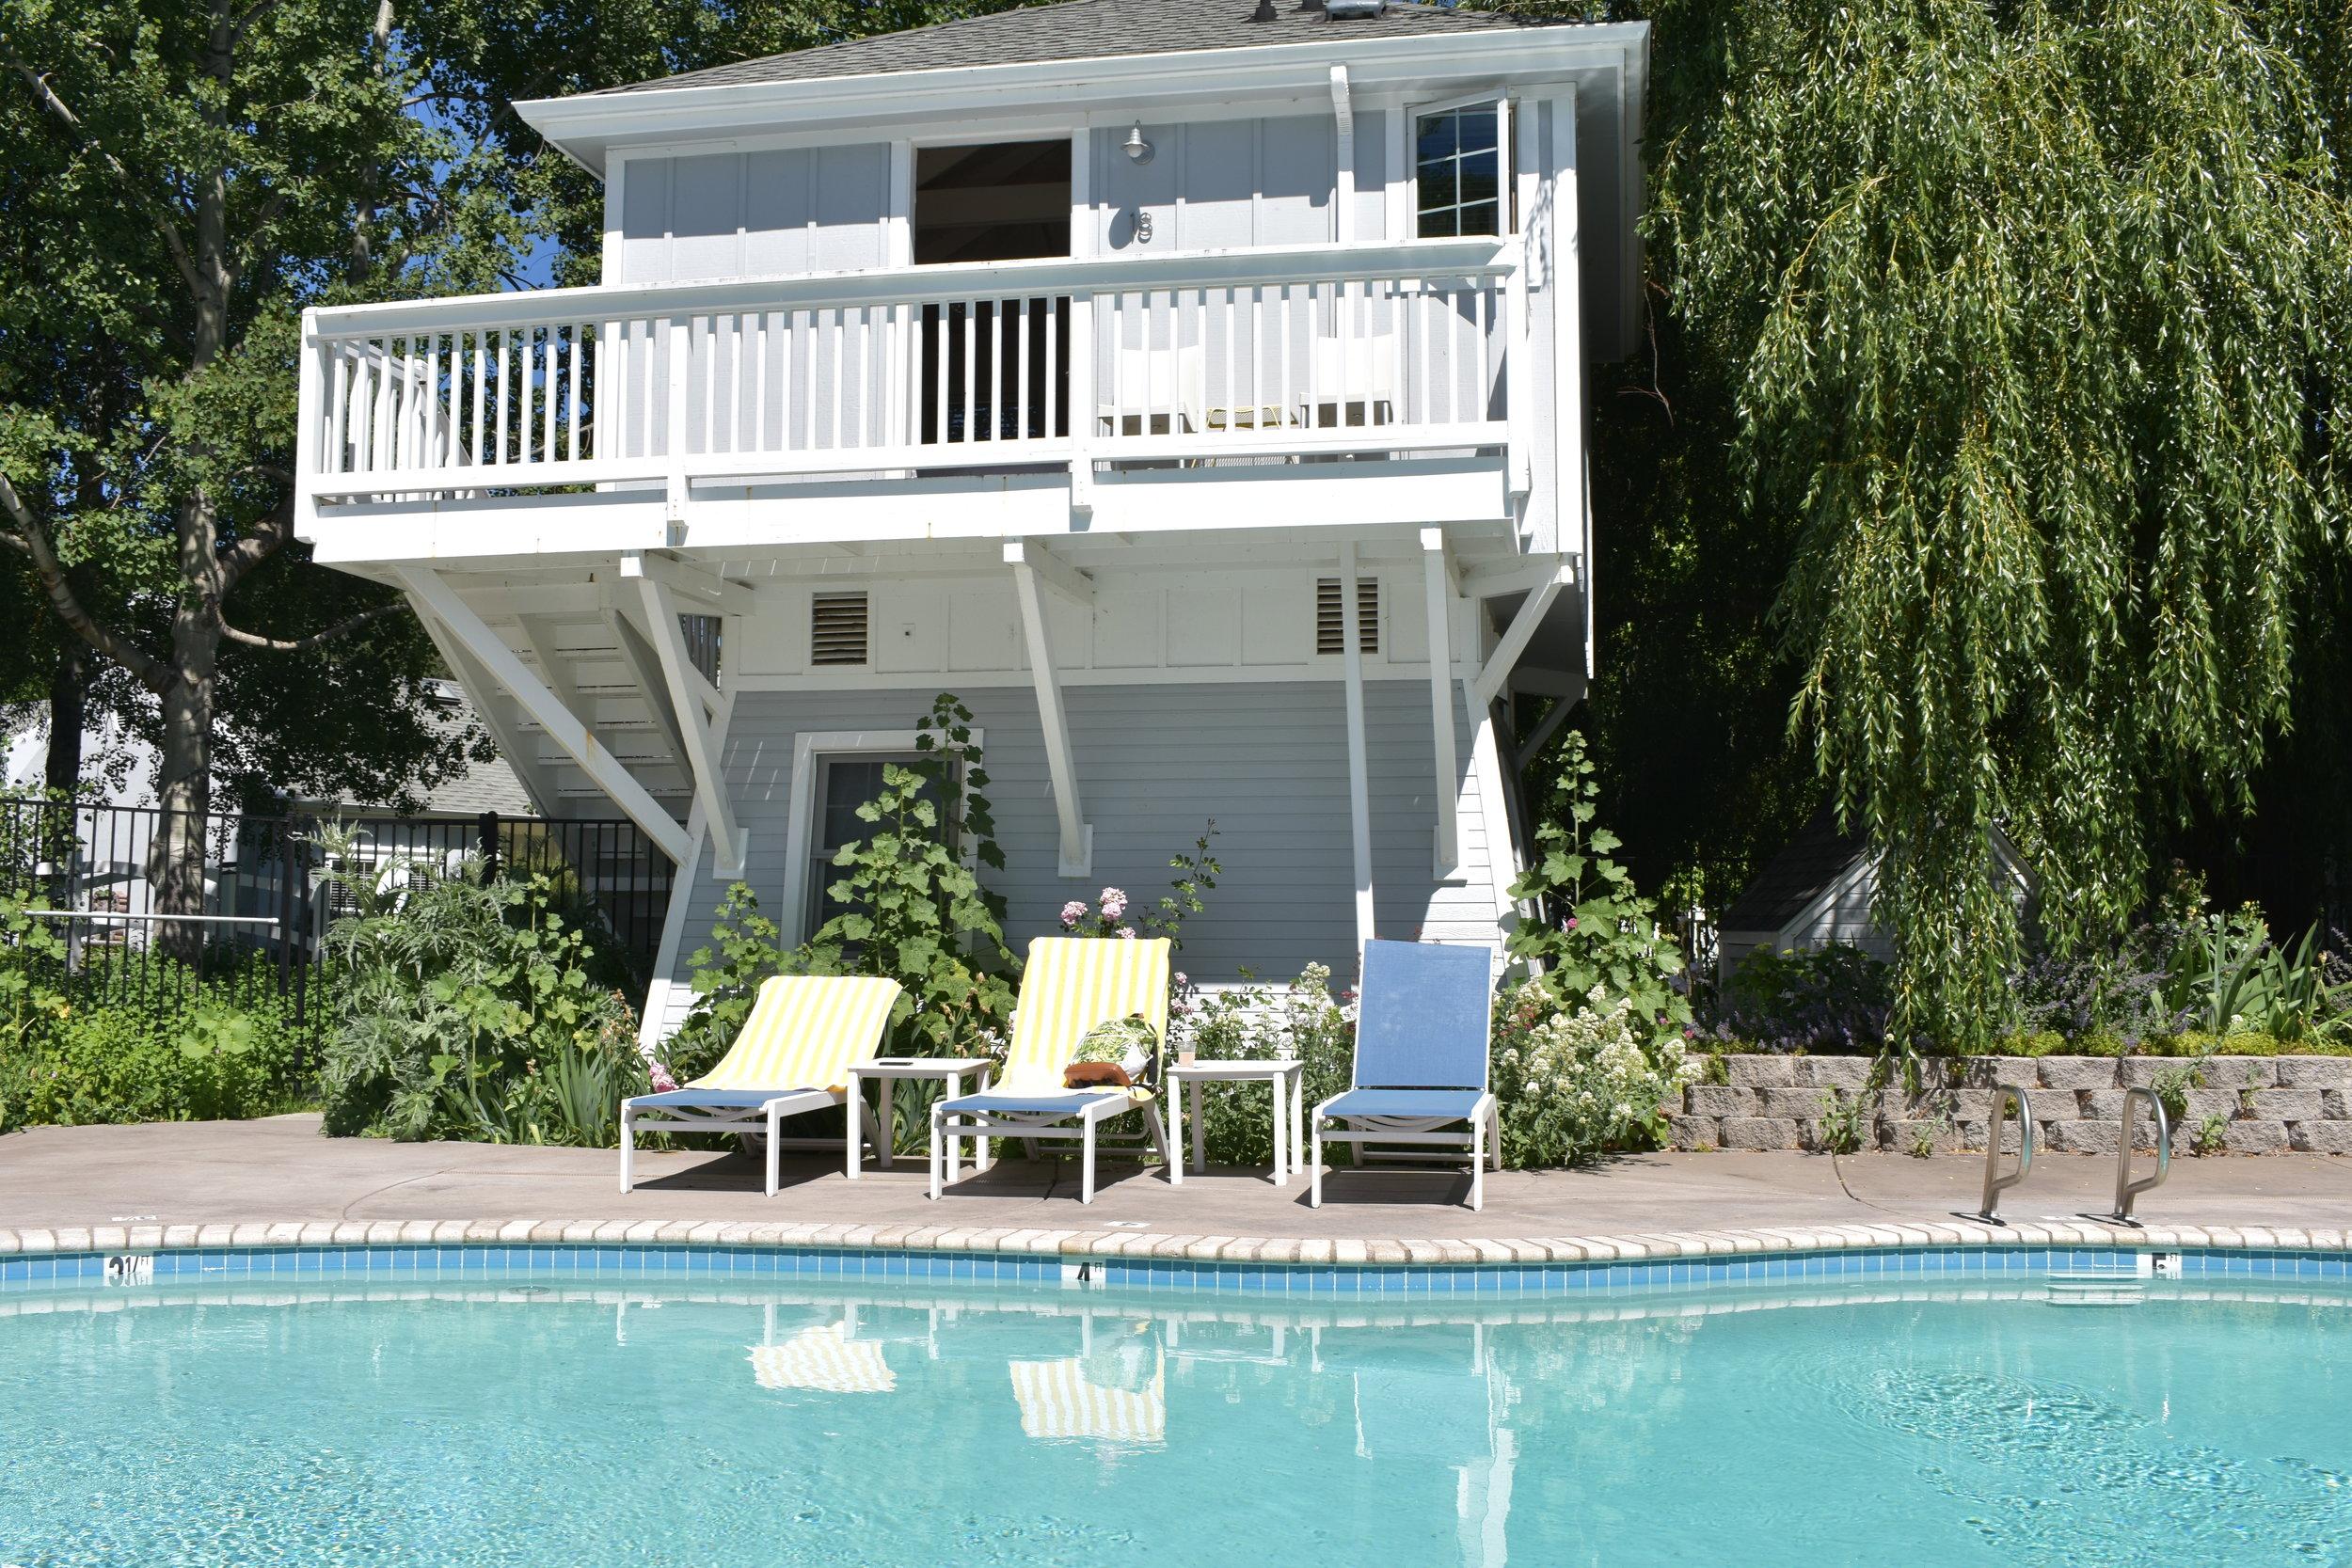 Poolside at Lithia Springs Resort in Ashland, Oregon